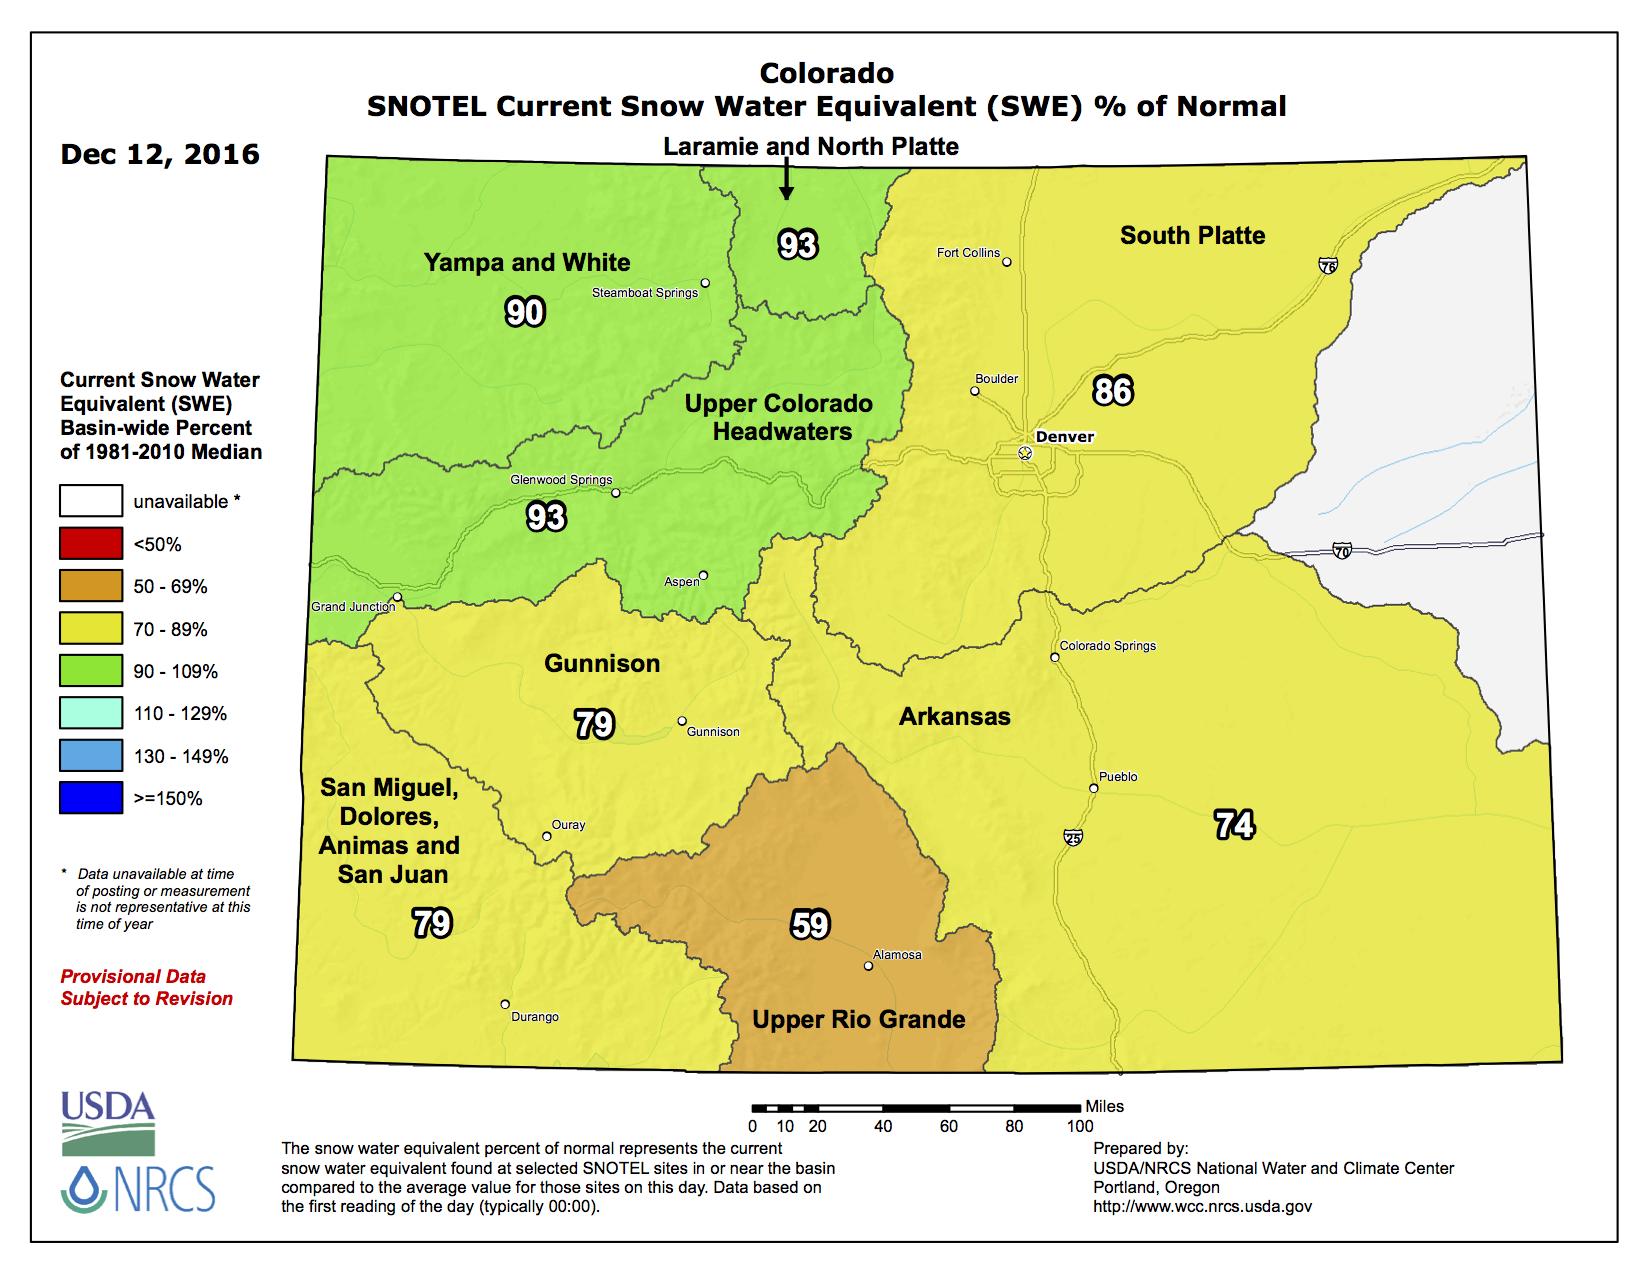 Nw Colorado Map.Snowpack News Nw Colorado And Upper Coloradoriver Basin Make It